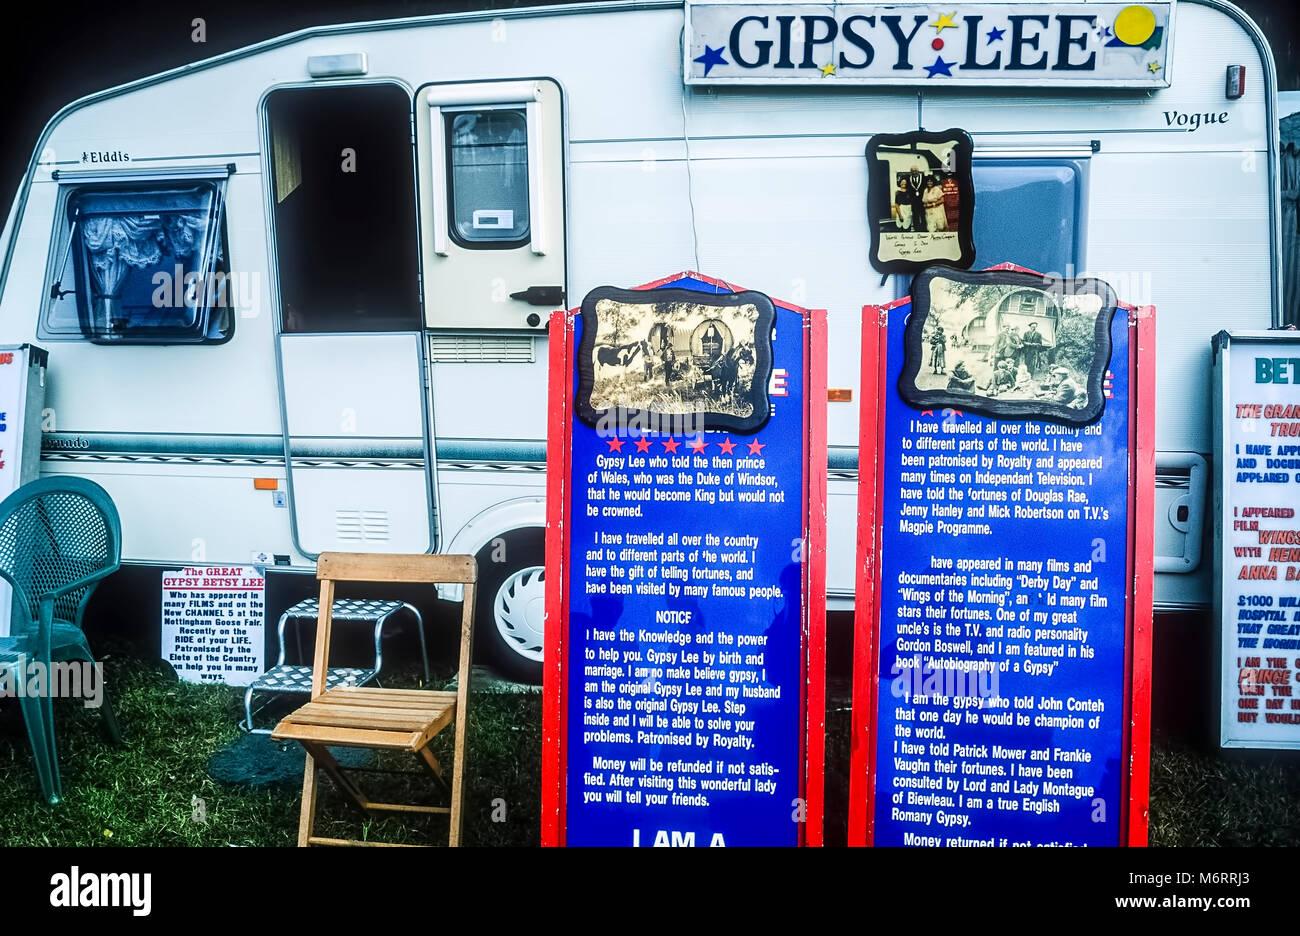 Gipsy Lee fortune teller caravan. - Stock Image